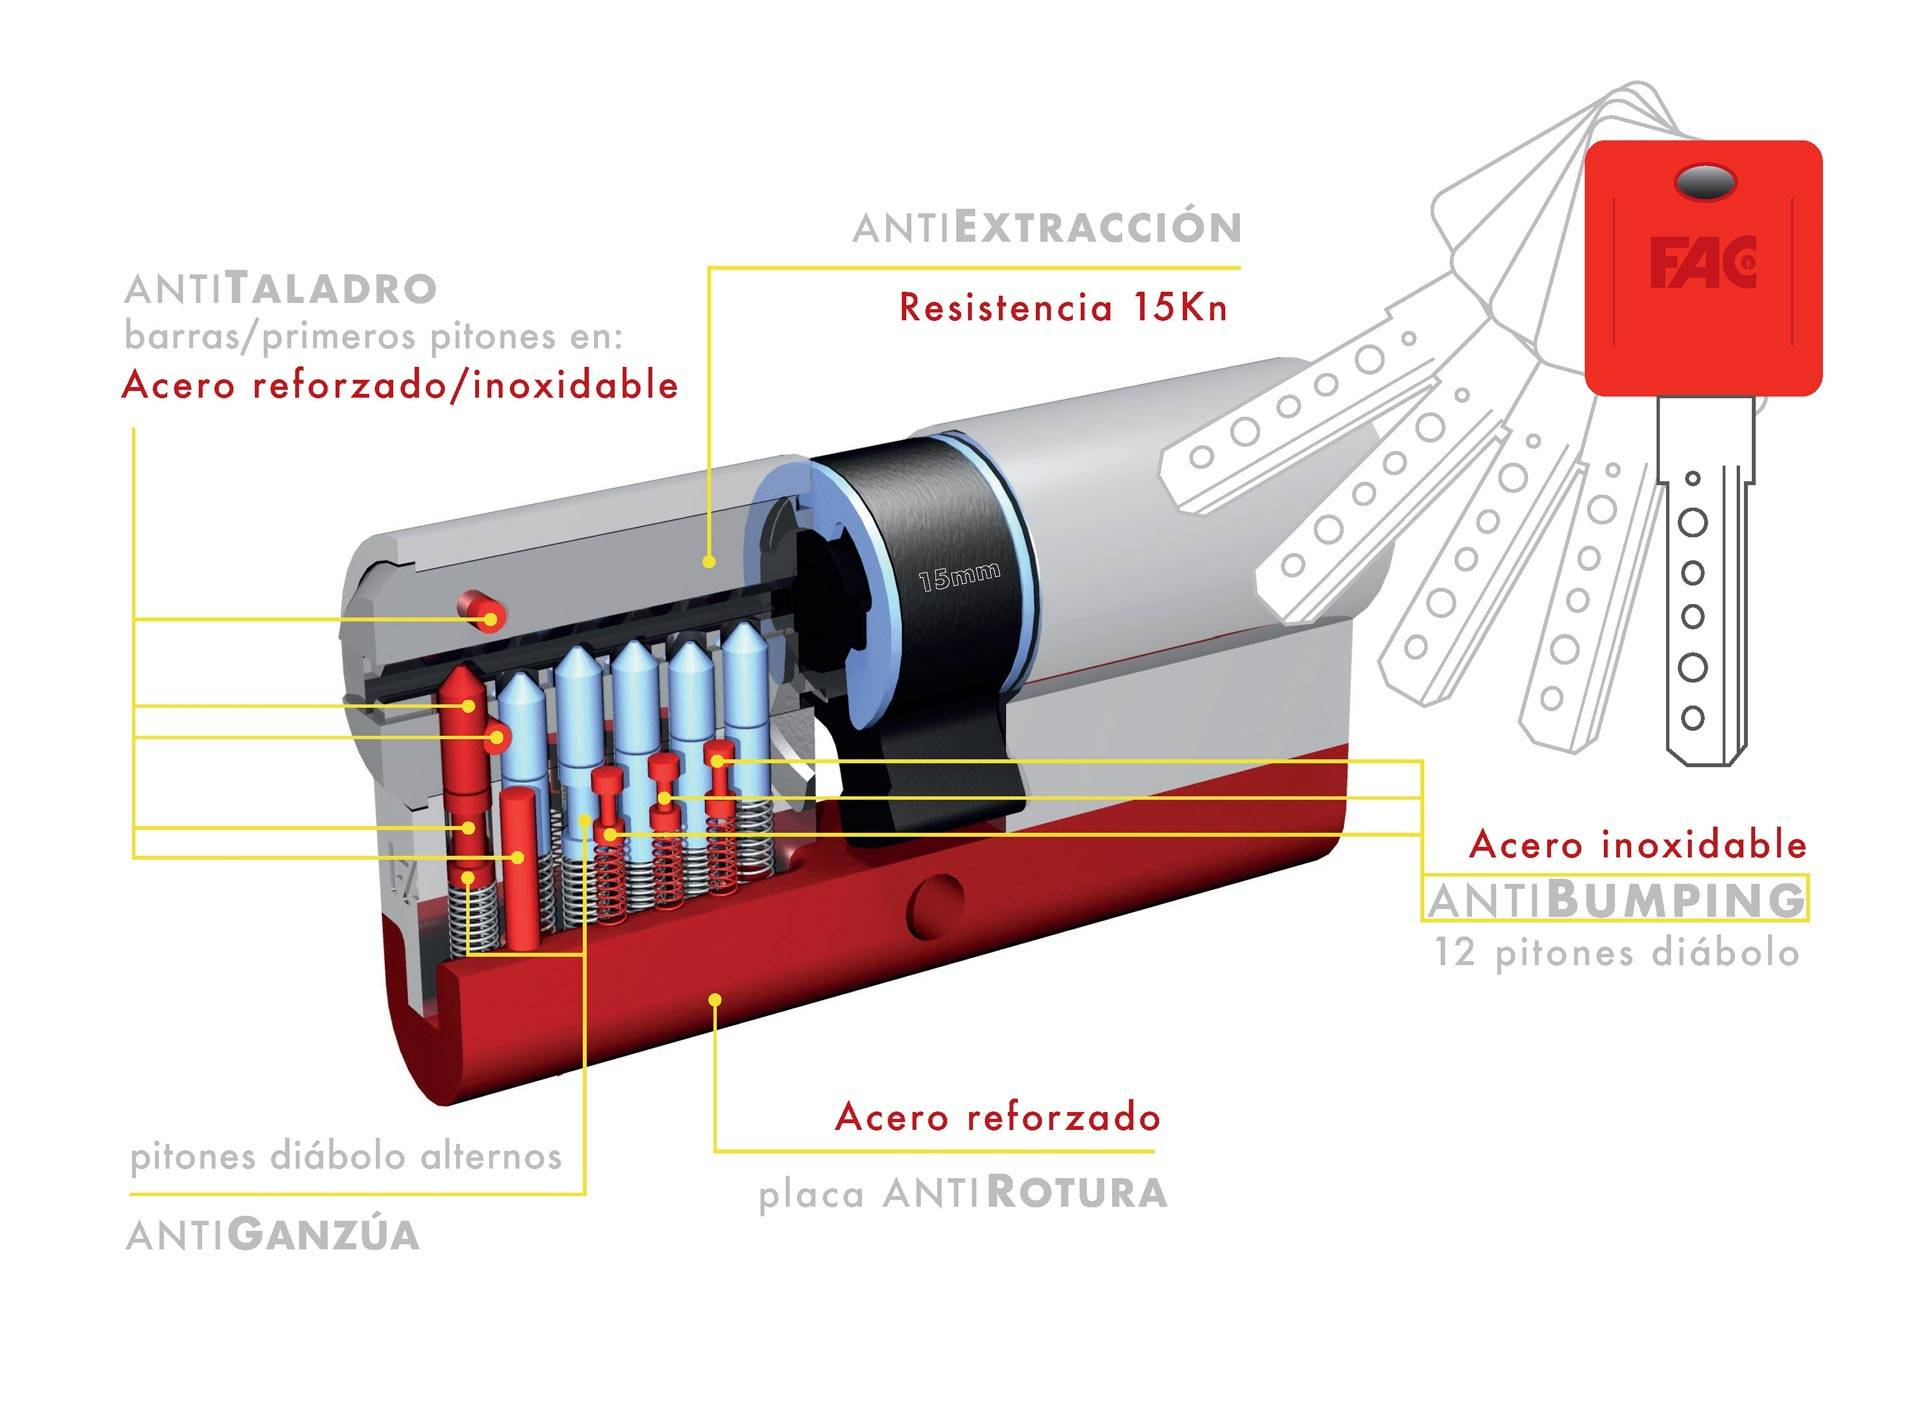 Cilindro anti-bumping